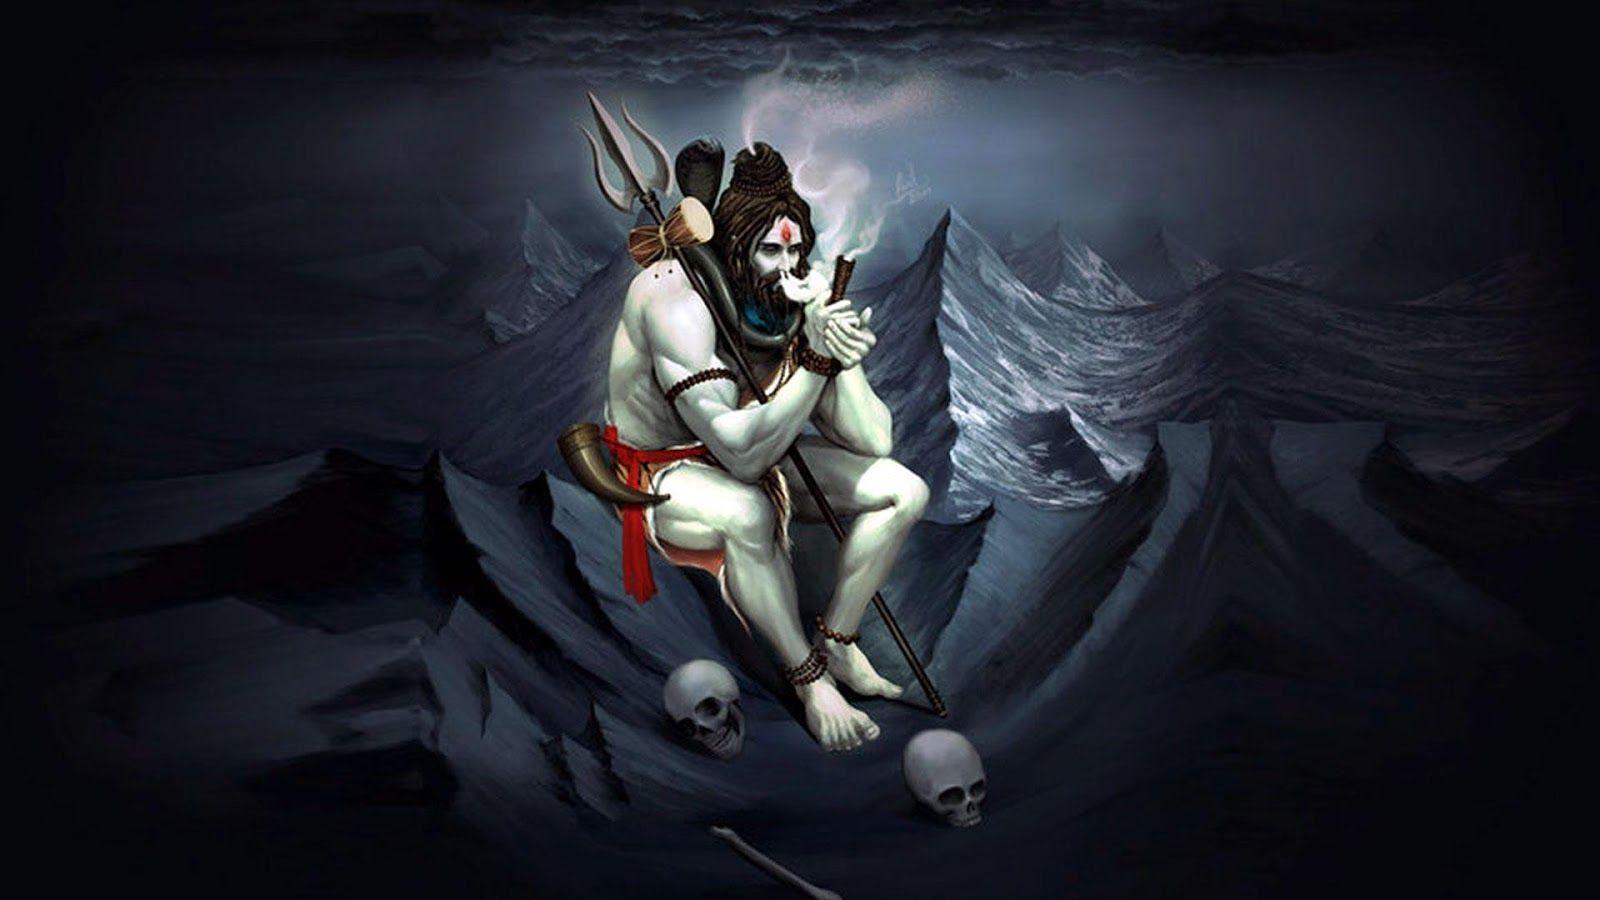 Image Result For Mahadev Hd Wallpaper Download Angry Lord Shiva Lord Shiva Hd Wallpaper Lord Shiva